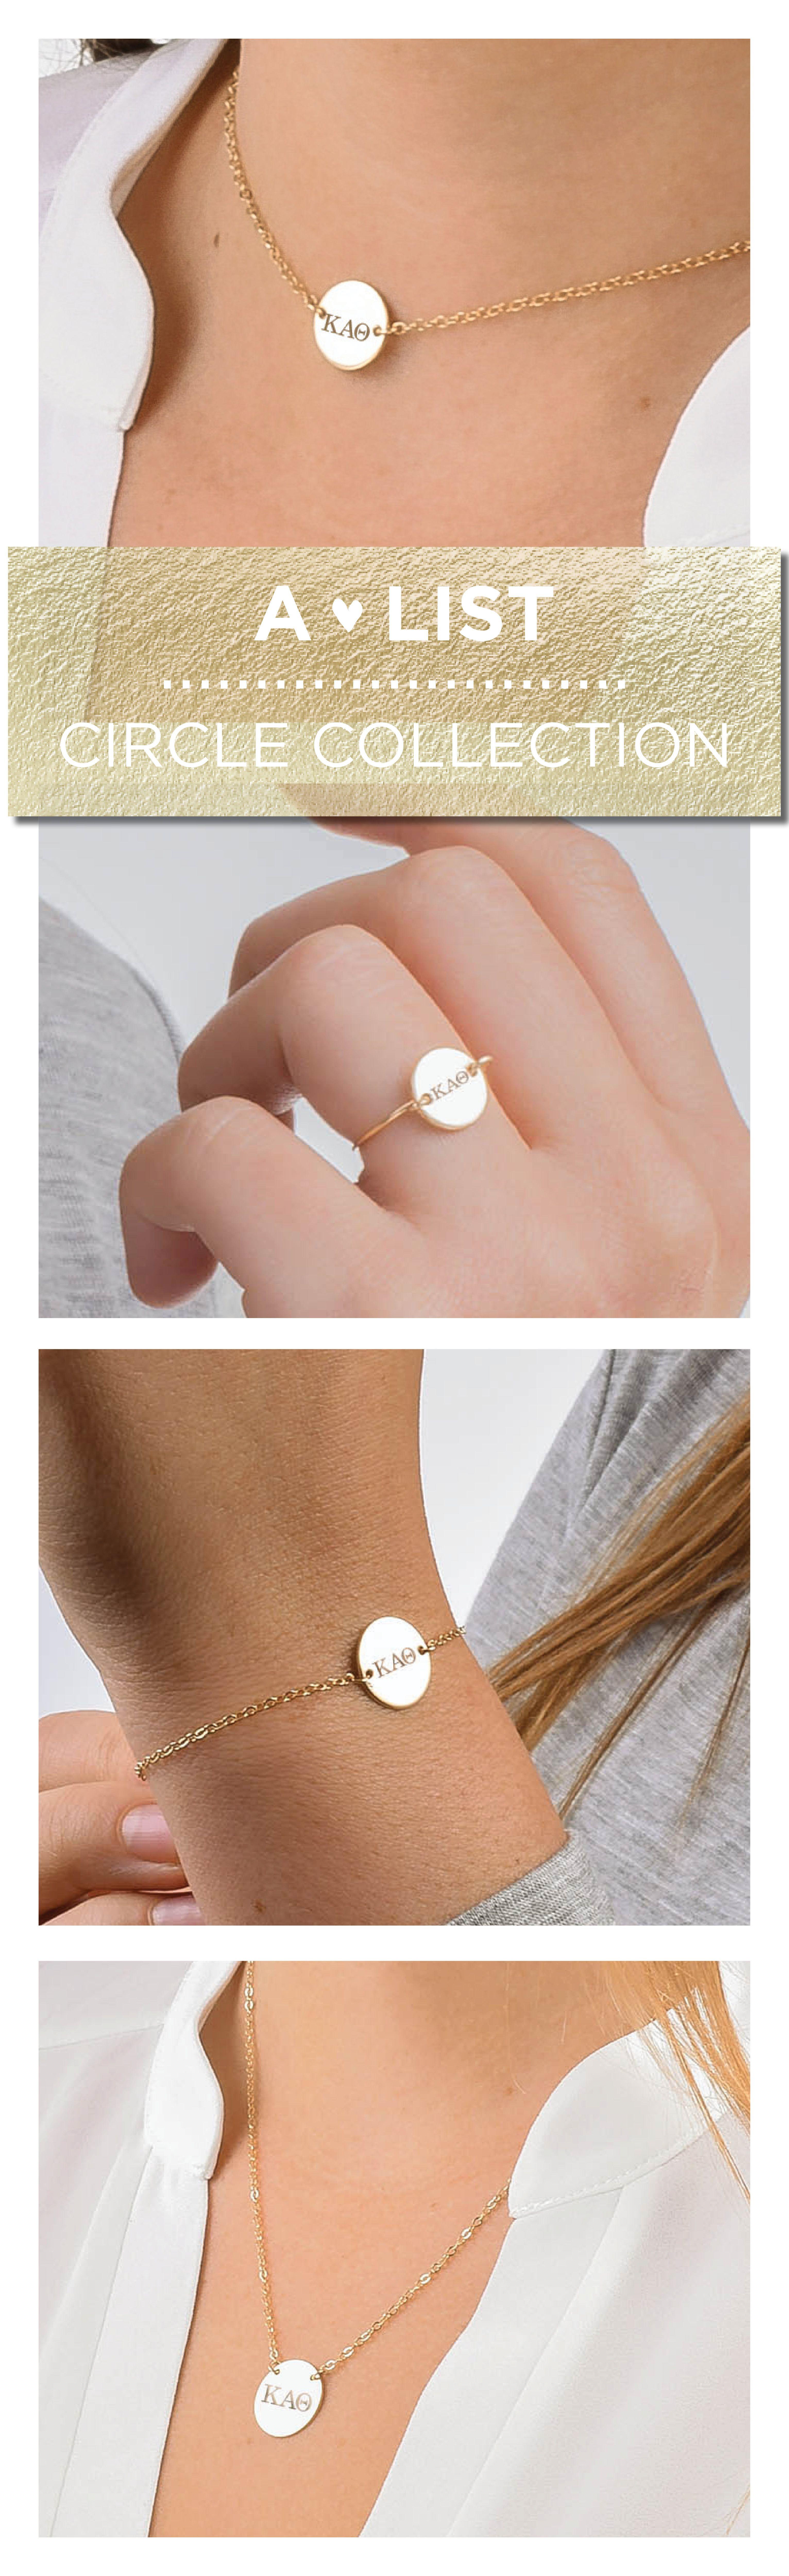 This Dainty Kappa Alpha Theta Circle Collection From Www Alistgreek Com Is A Simple And Moder Sorority Jewelry Alpha Omicron Pi Jewelry Alpha Sigma Tau Jewelry